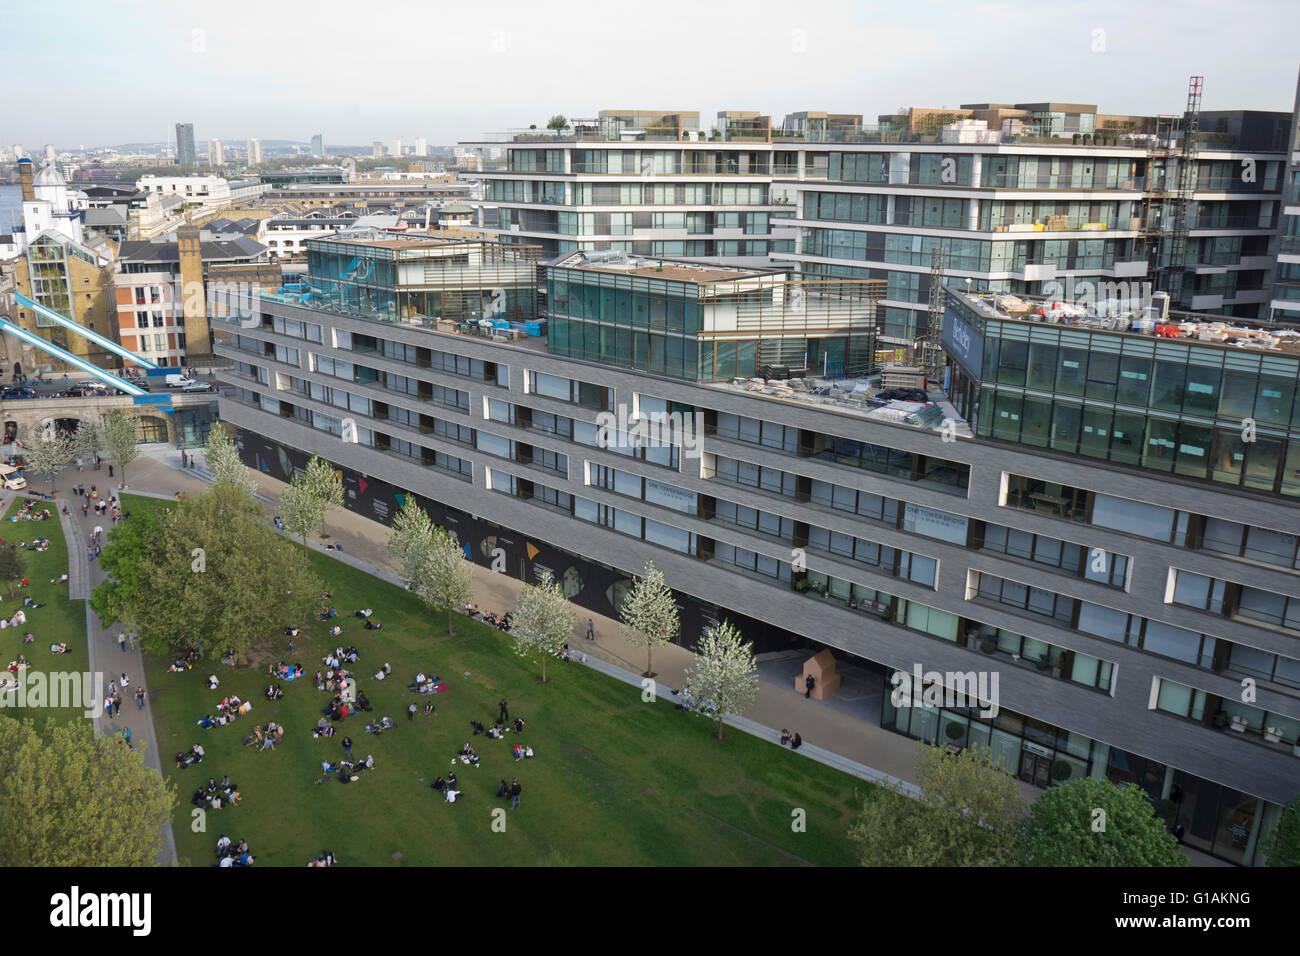 Views of Tower Bridge and new luxury housing developments near City Hall, London, UK - Stock Image